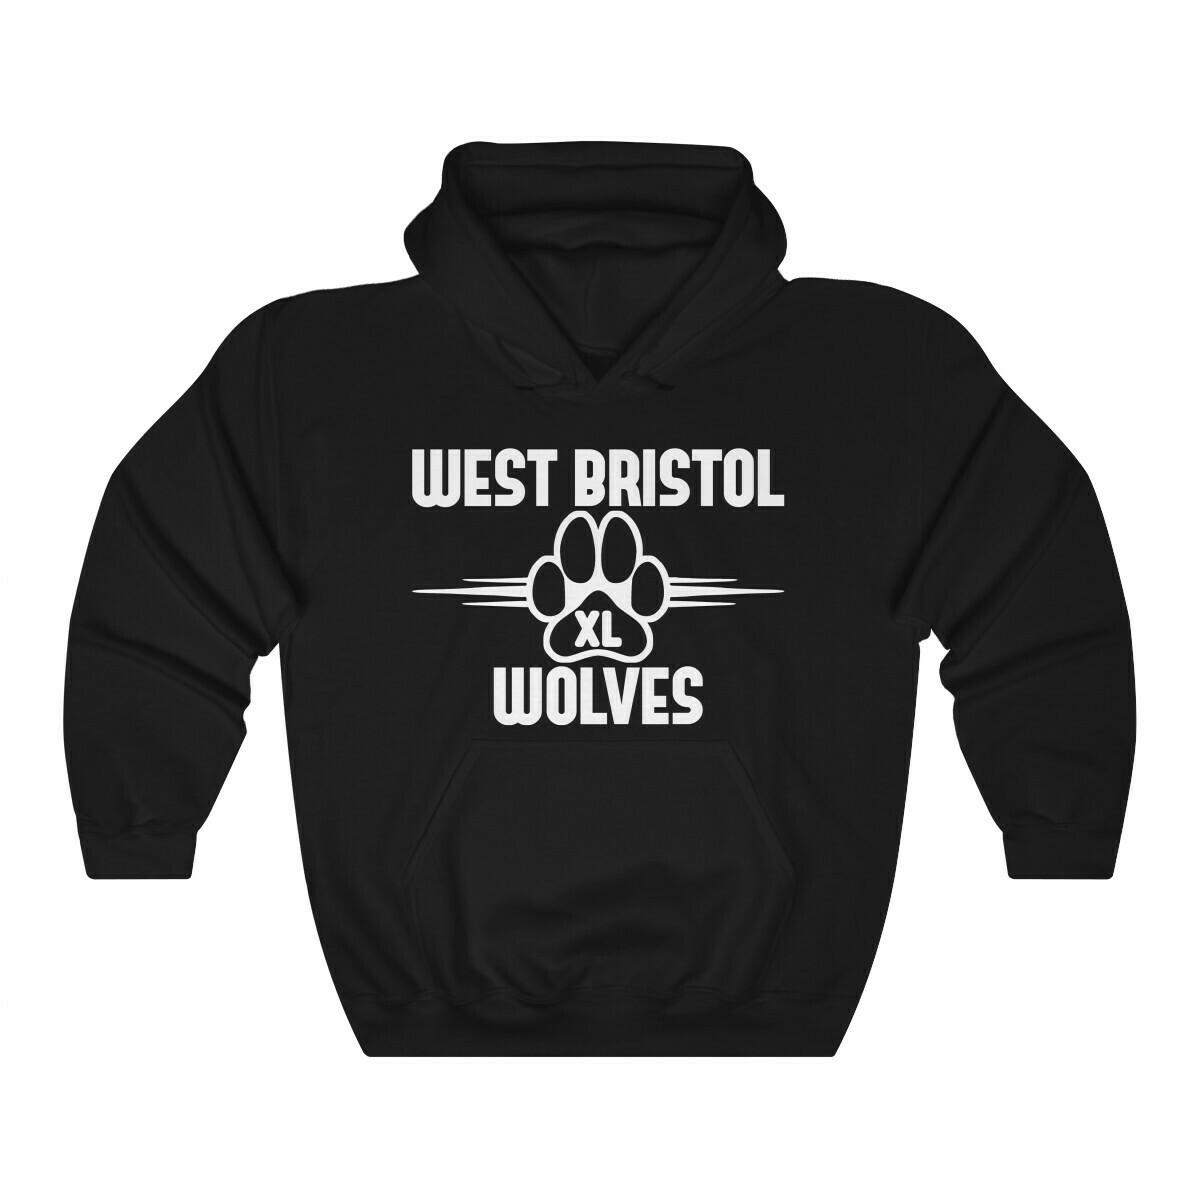 *West Bristol Wolves XL - 18500